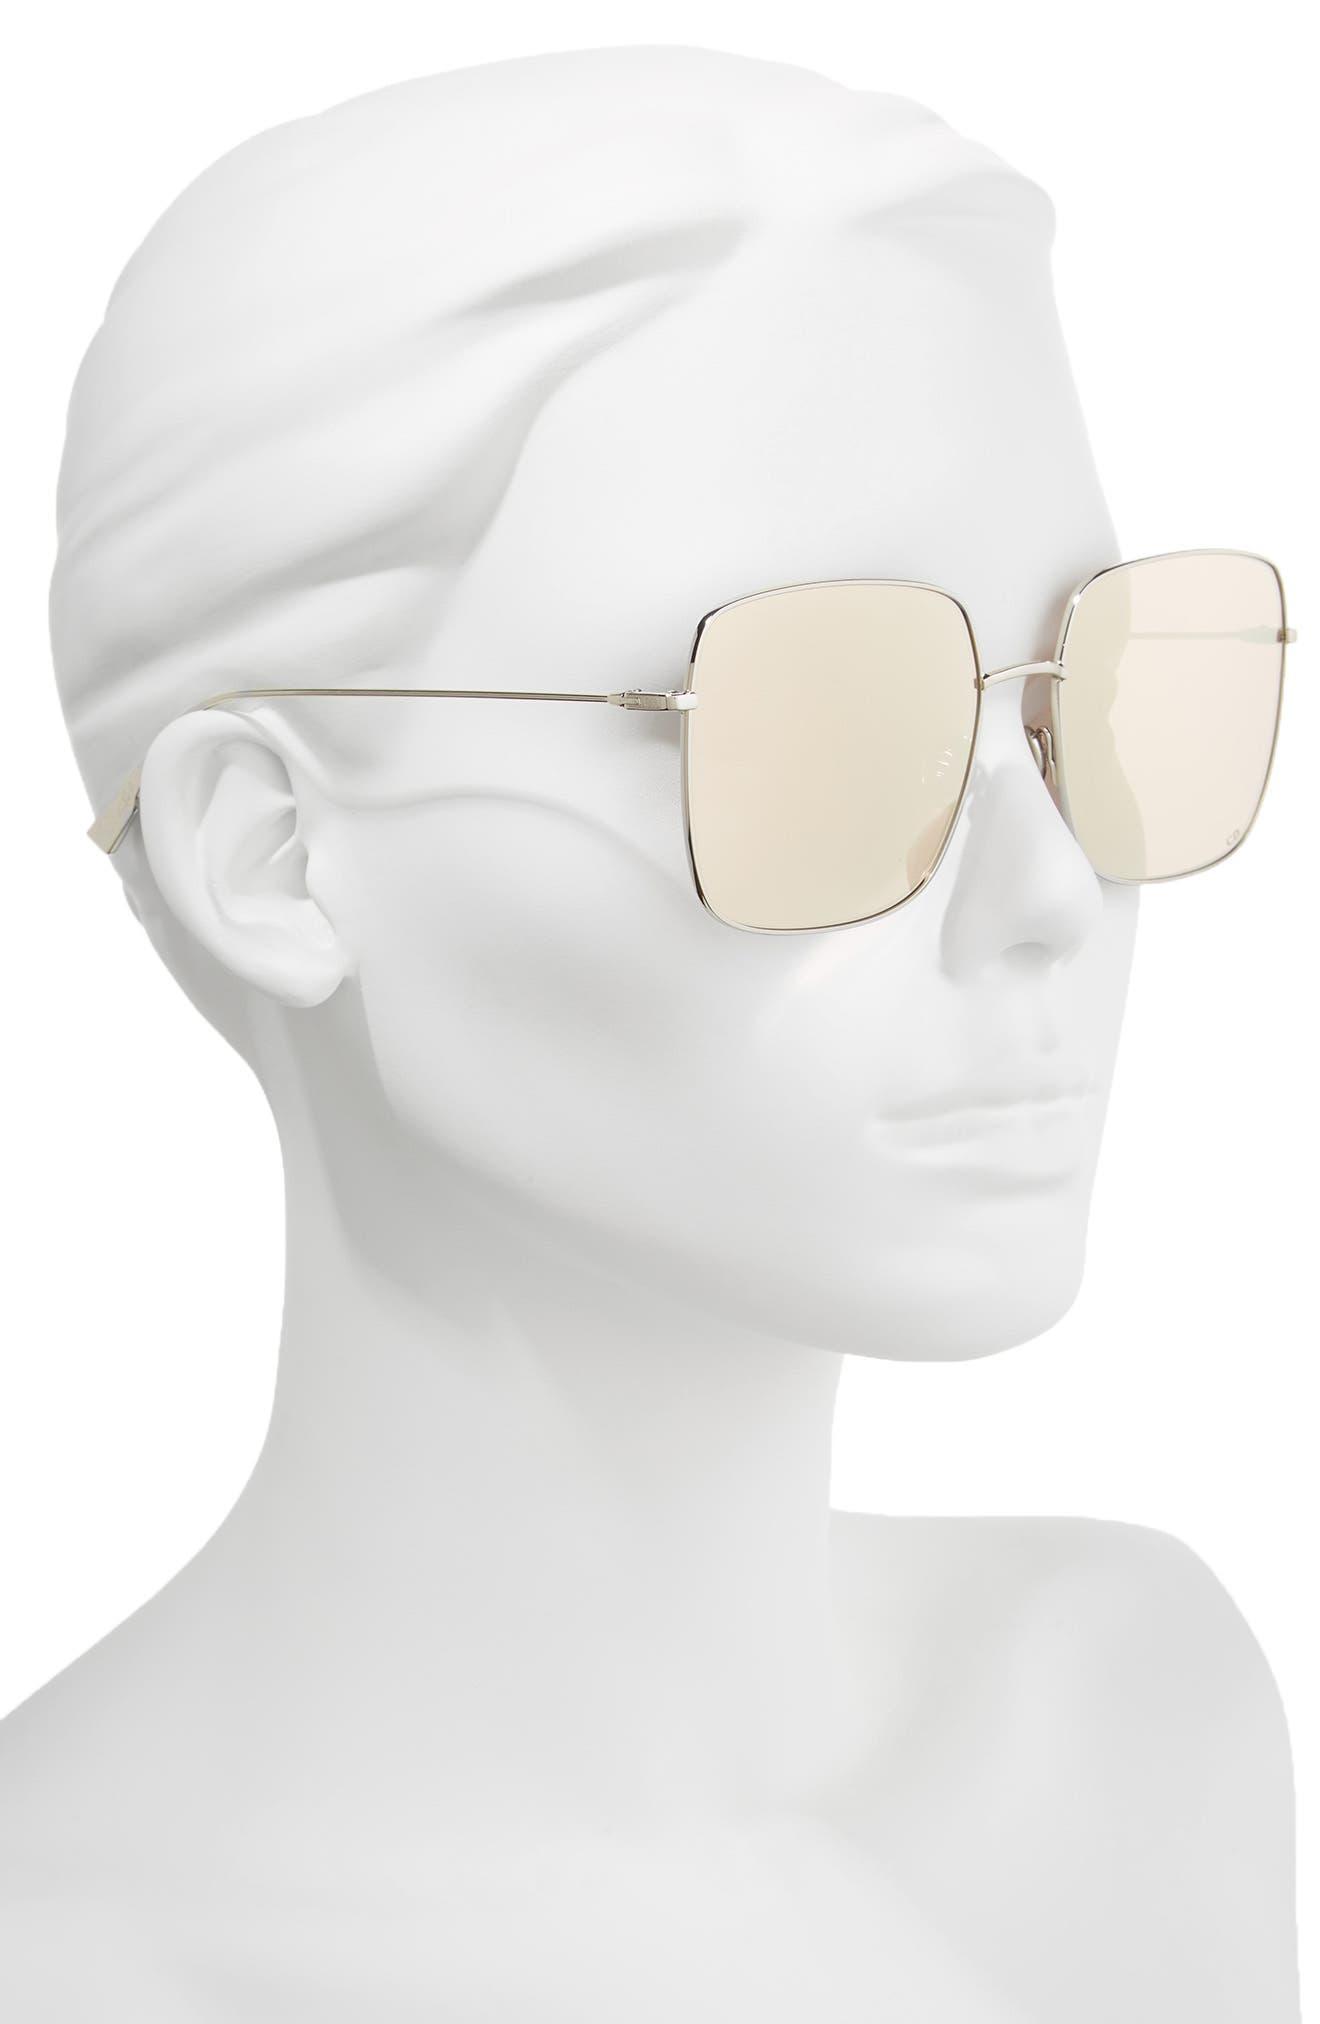 Stellaire 1 59mm Square Sunglasses,                             Alternate thumbnail 2, color,                             PALLADIUM